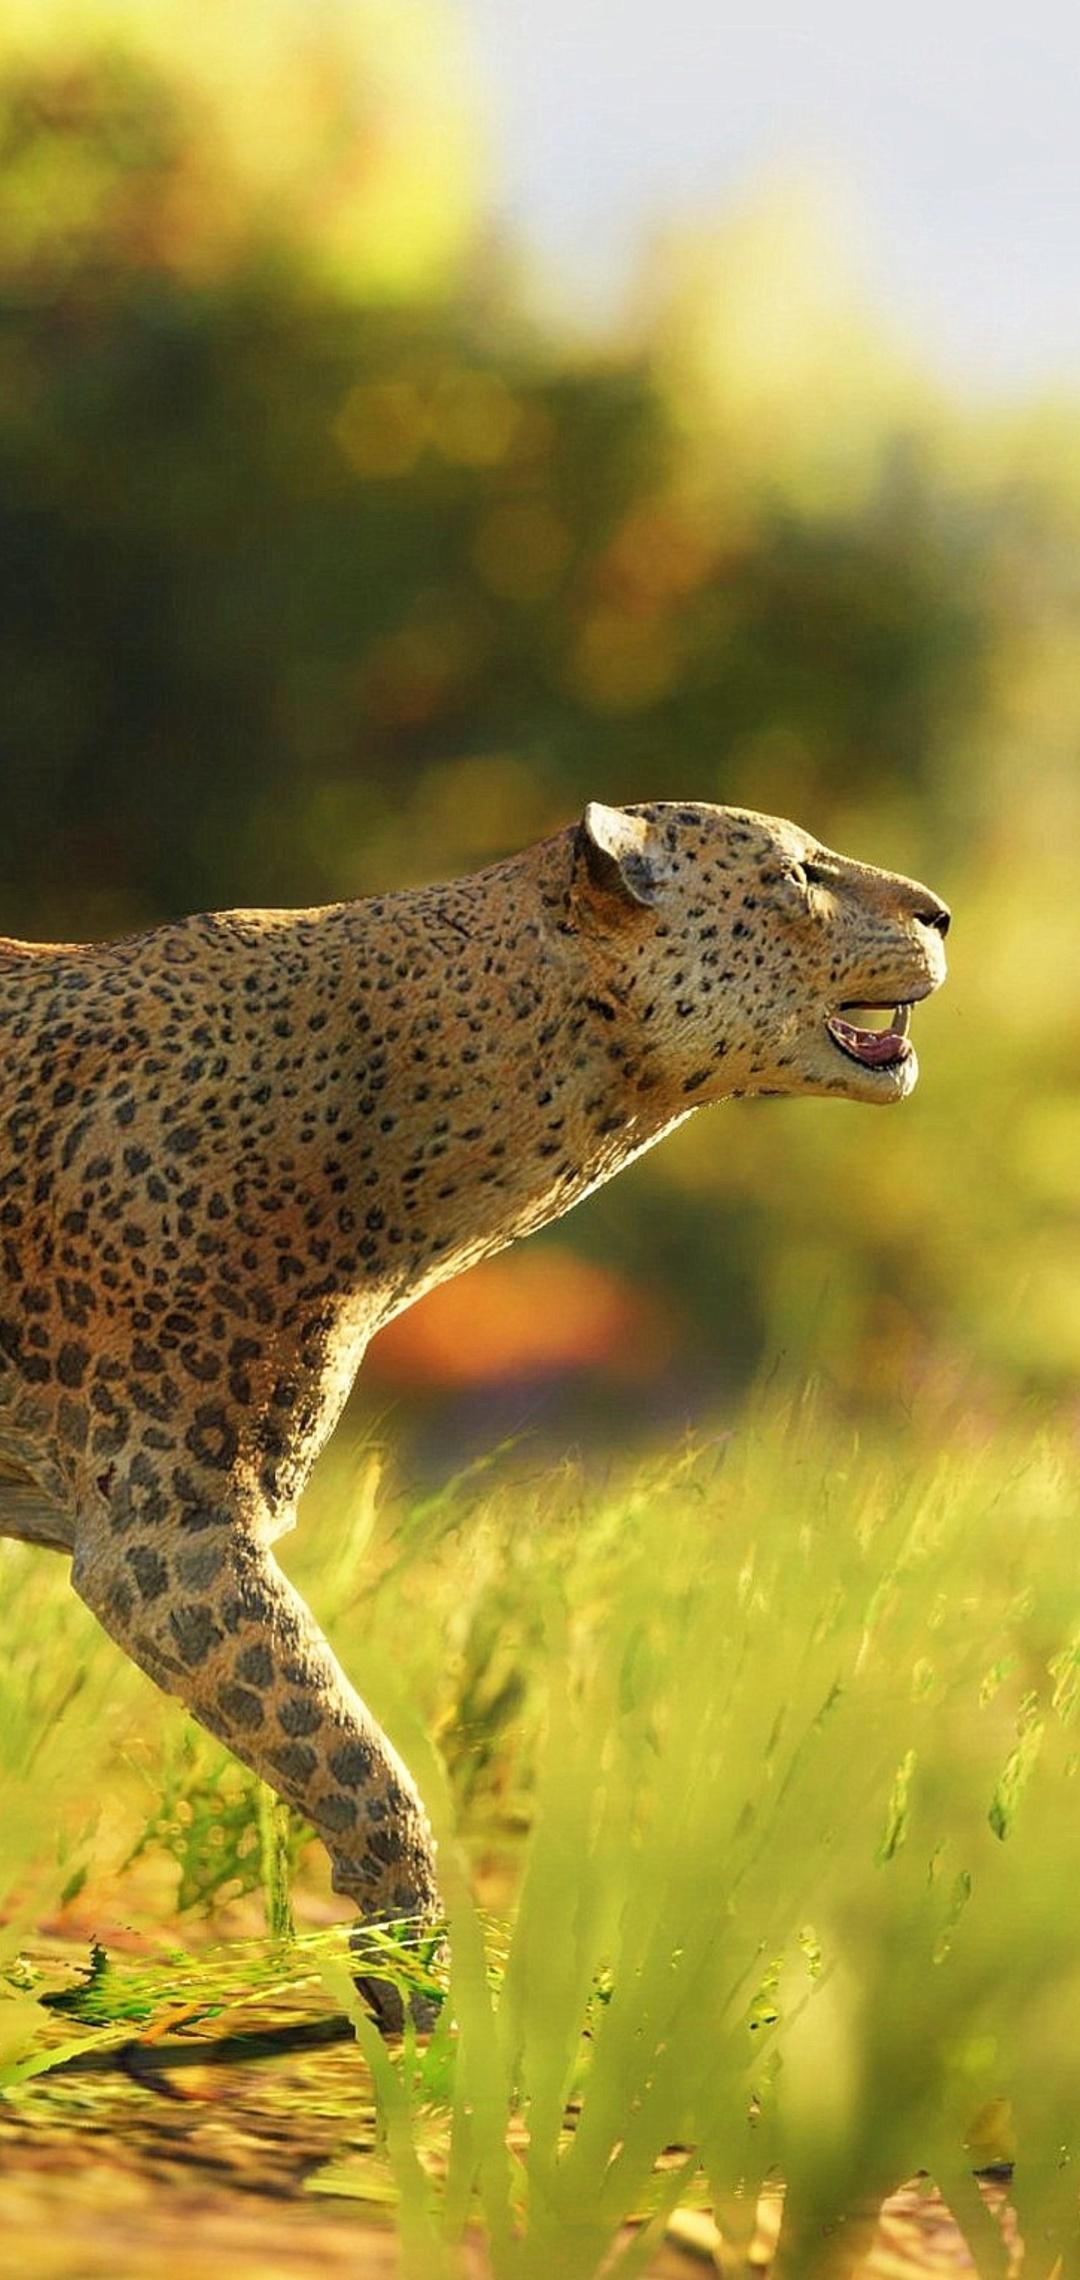 leopard-wild-4k-t4.jpg